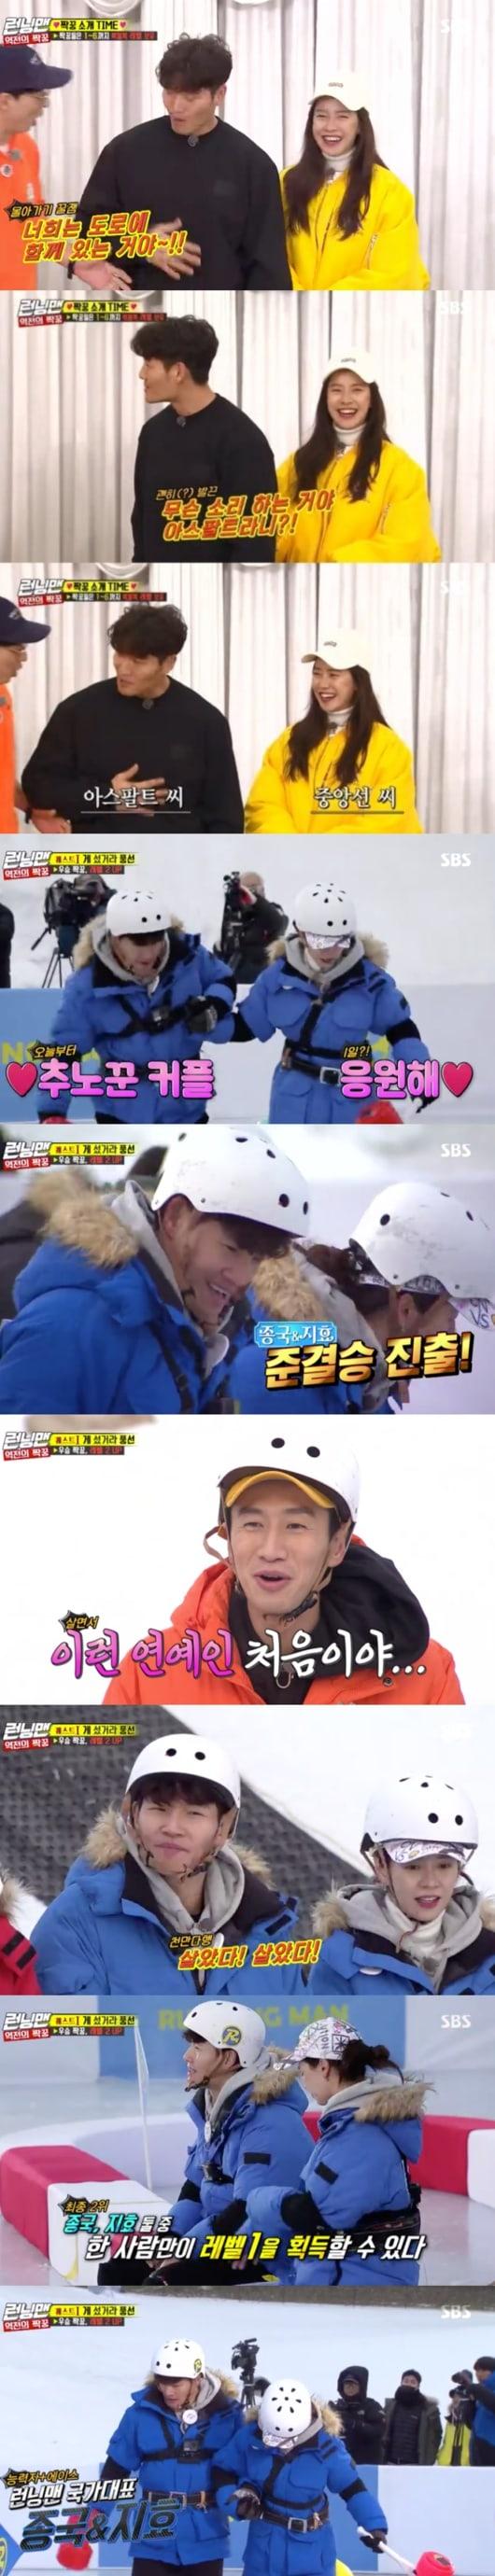 Song Ji Hyo And Kim Jong Kook S Love Line Builds Up On Running Man Soompi